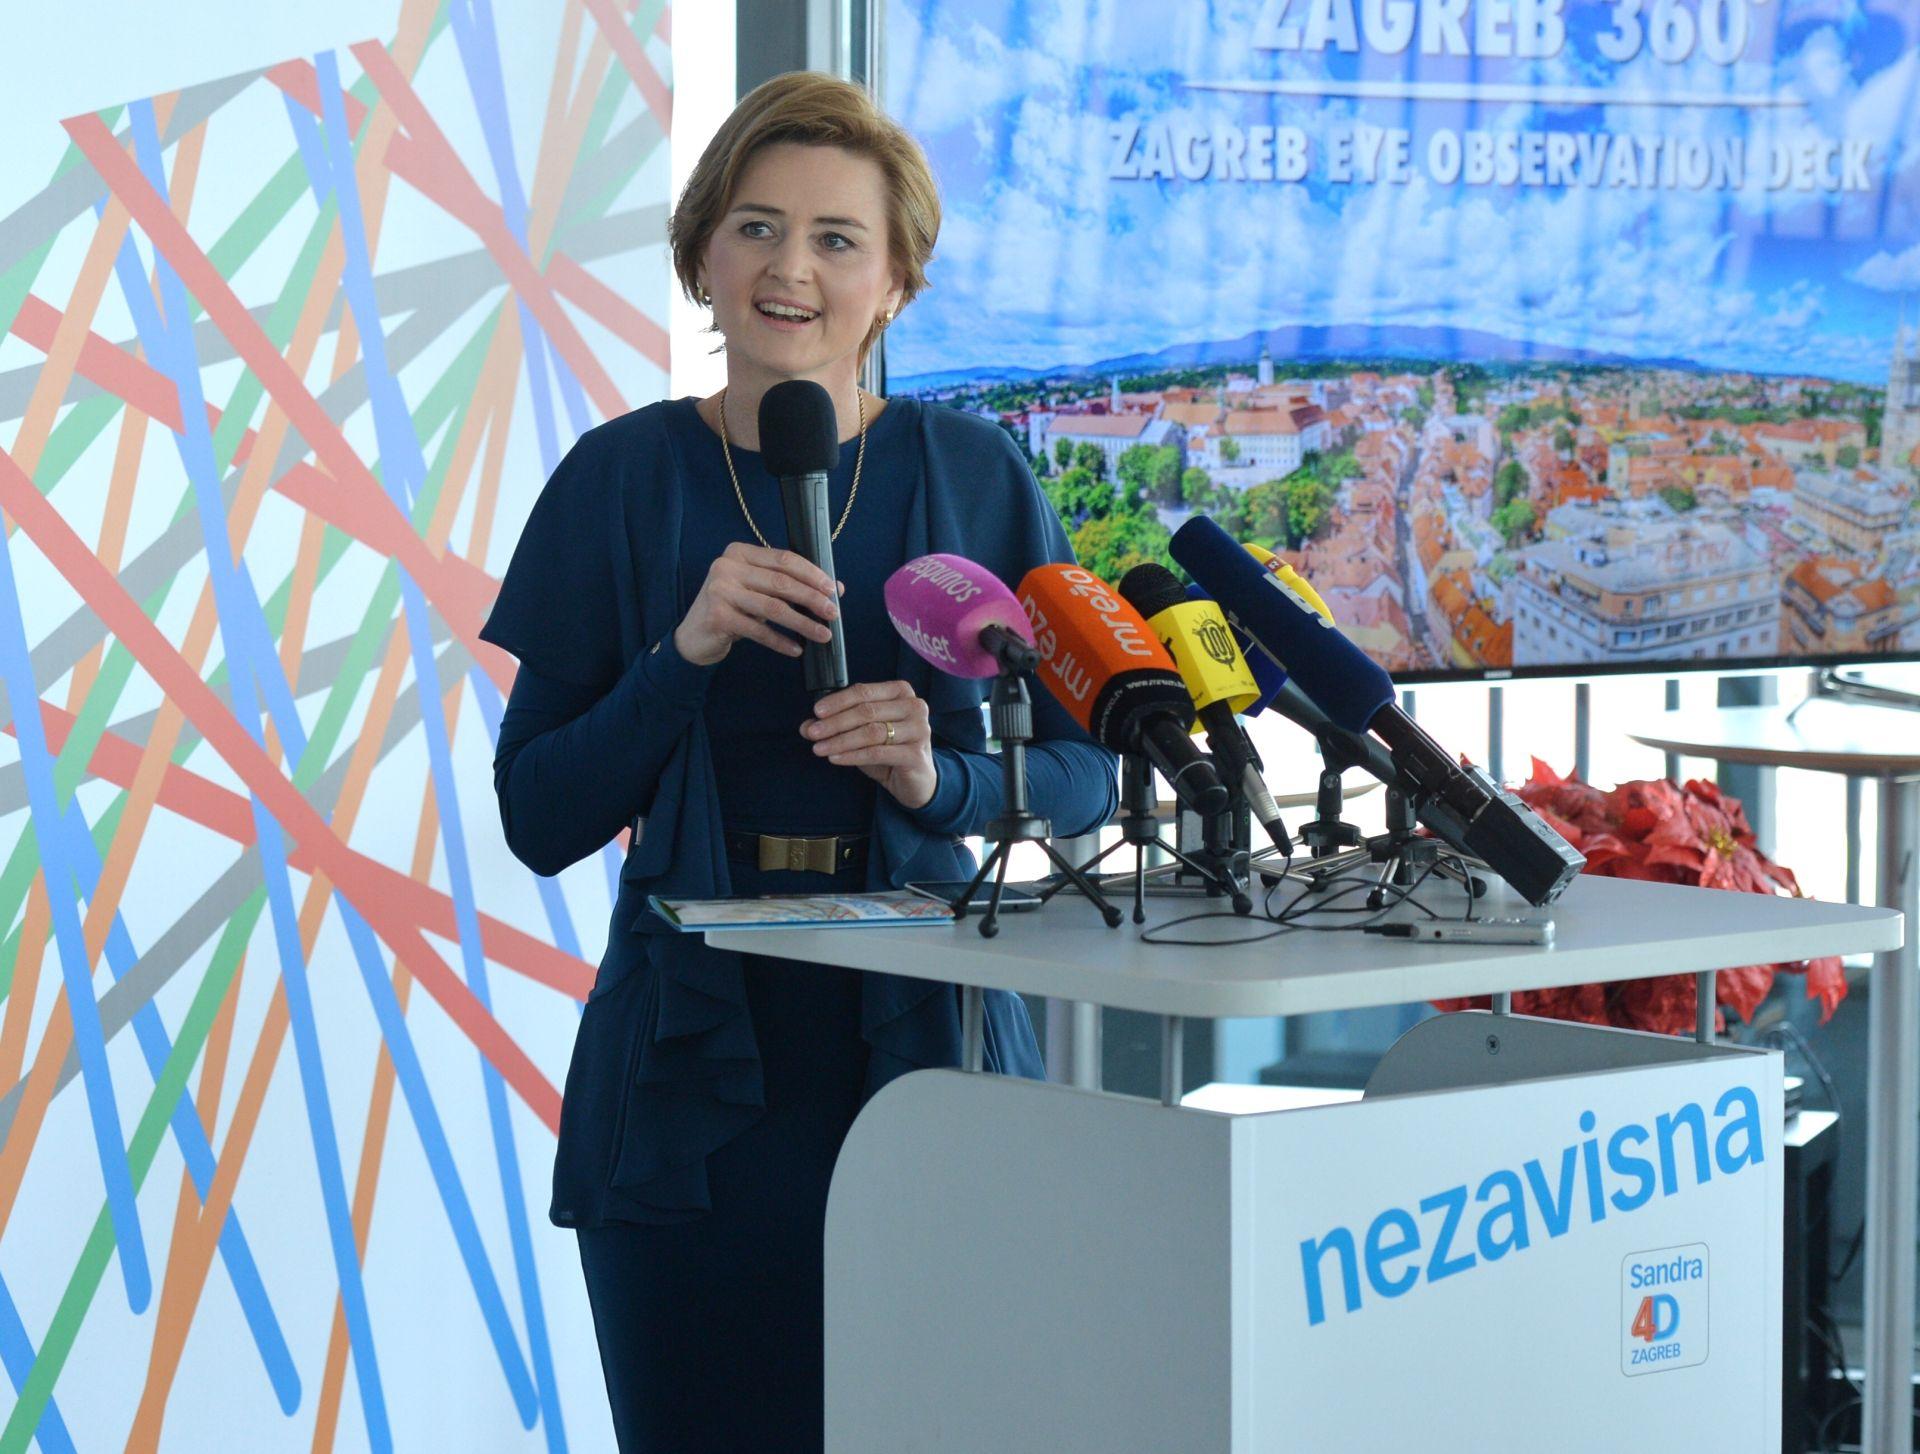 'RAZVOJ U 4D': Švaljek predstavila politički program i stručni tim za Zagreb